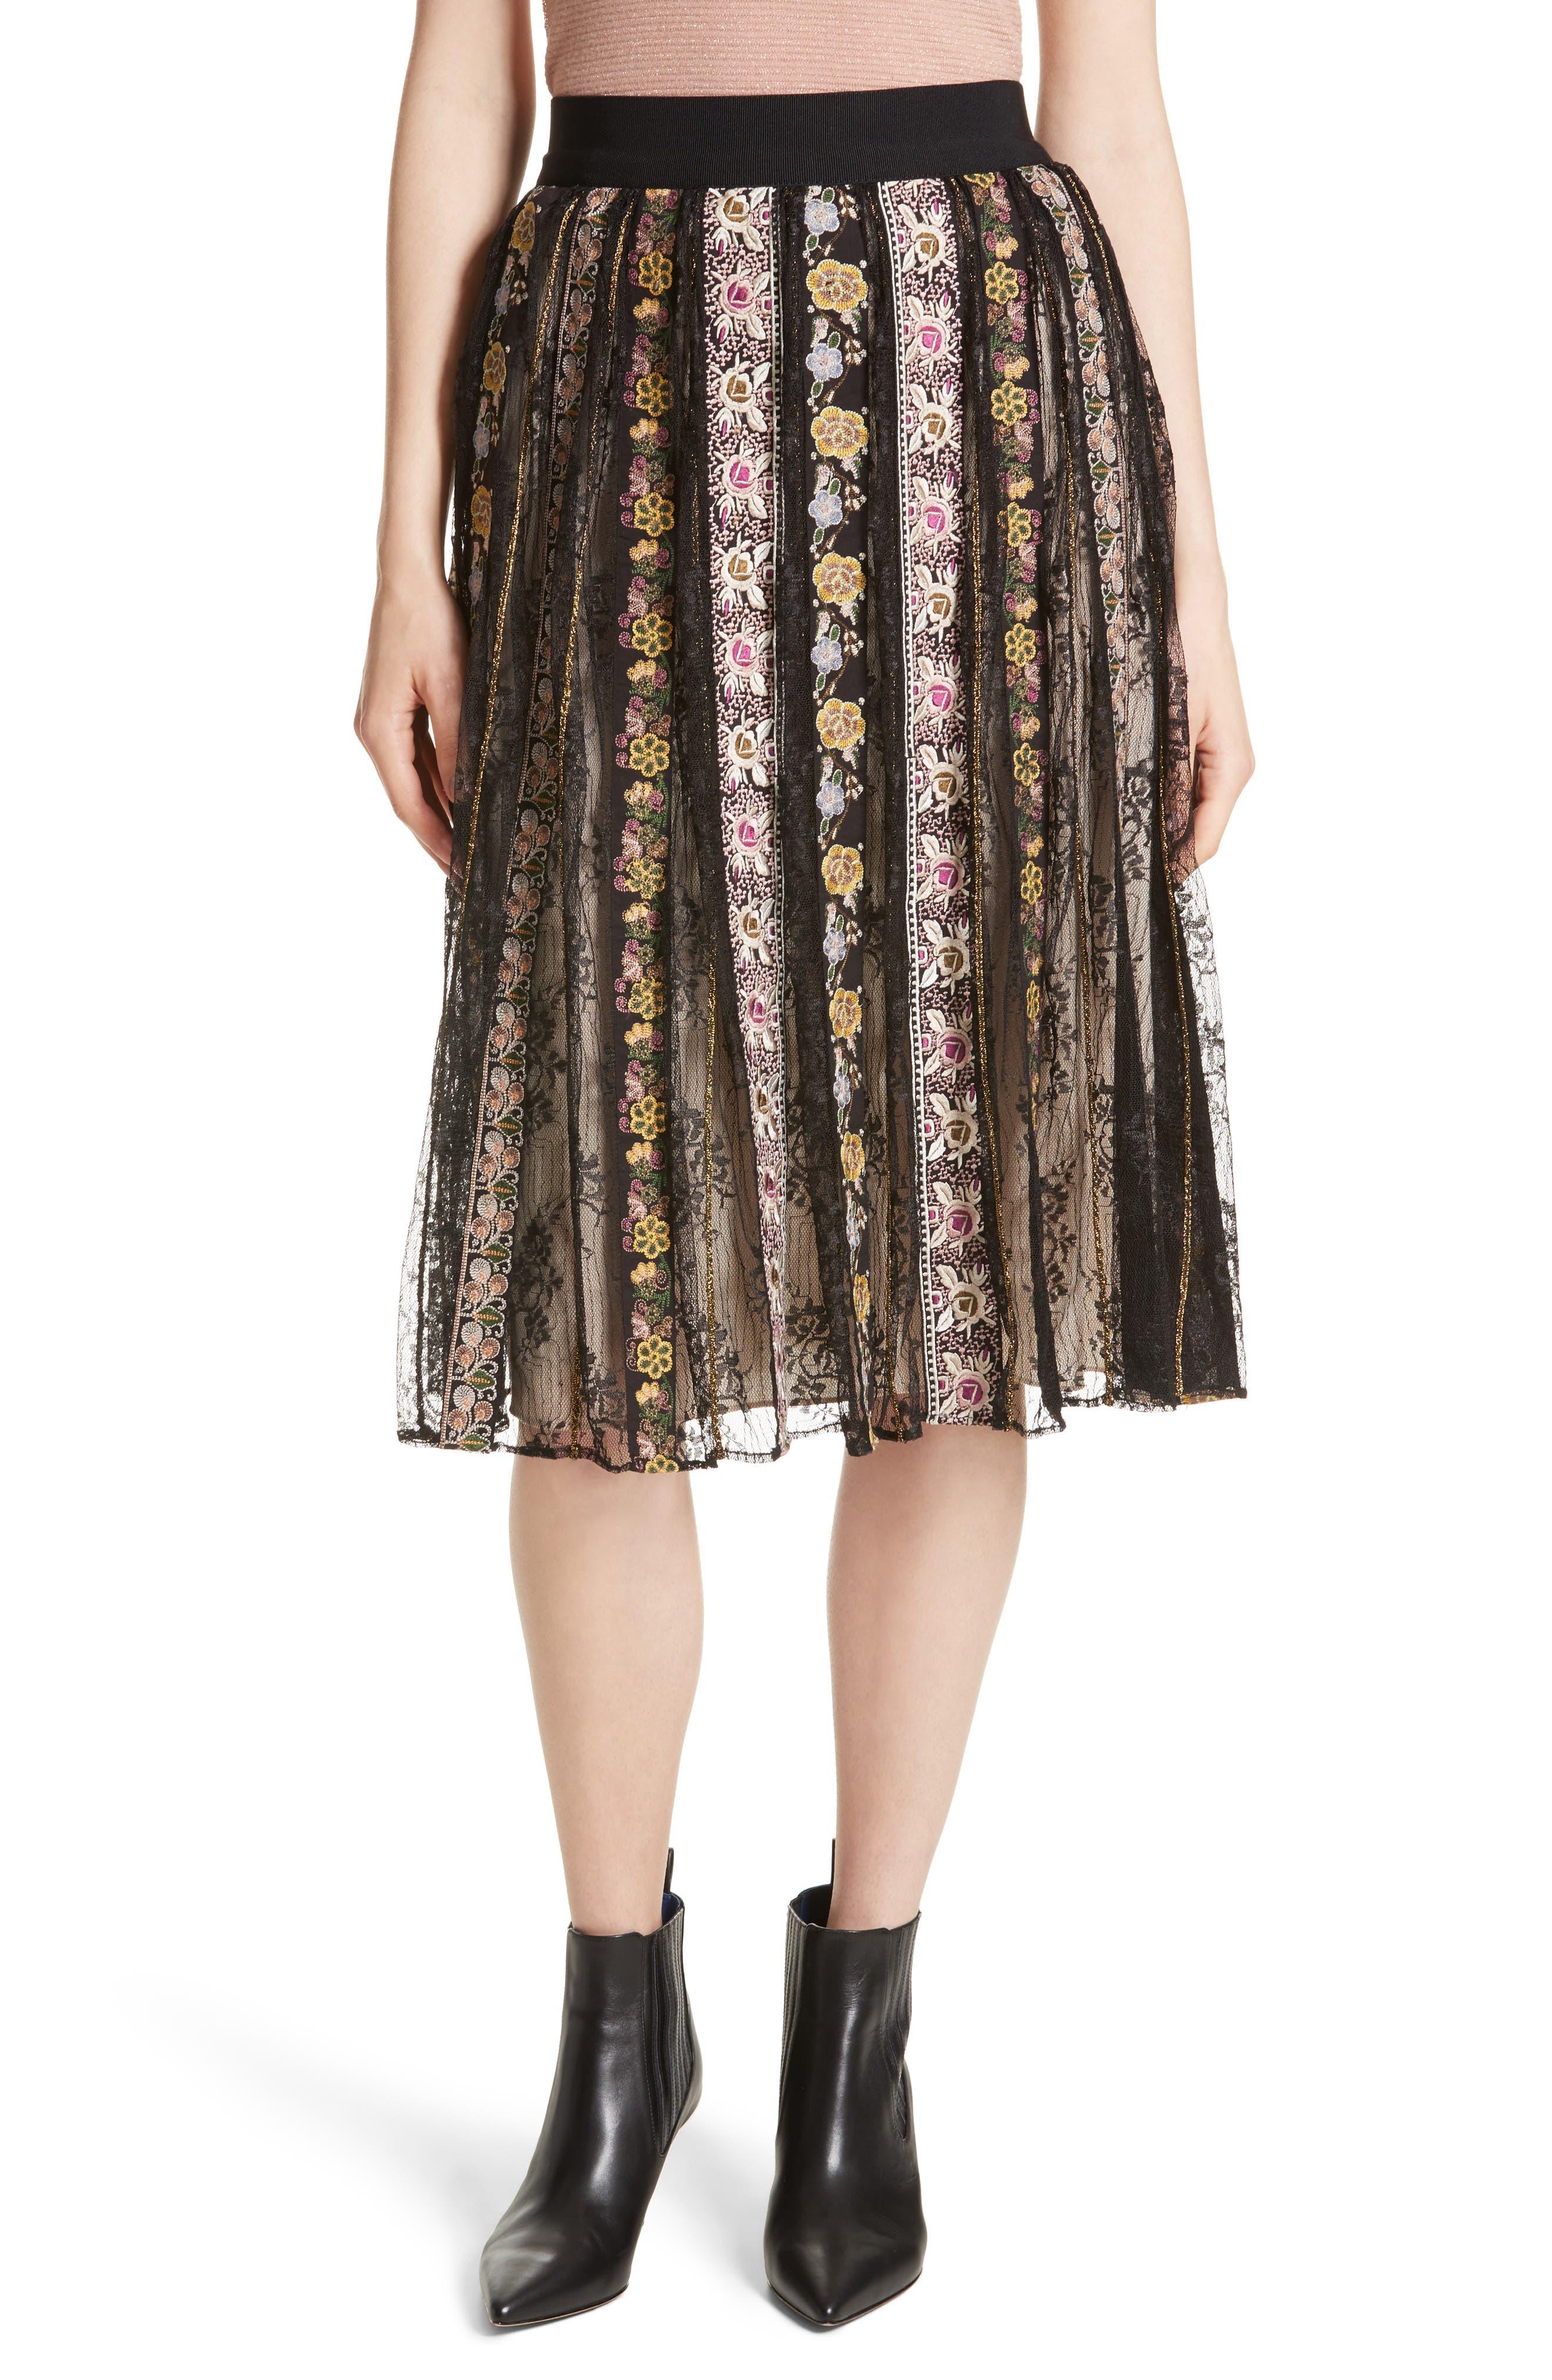 Alice + Olivia Birdie Flower Embroidered Skirt